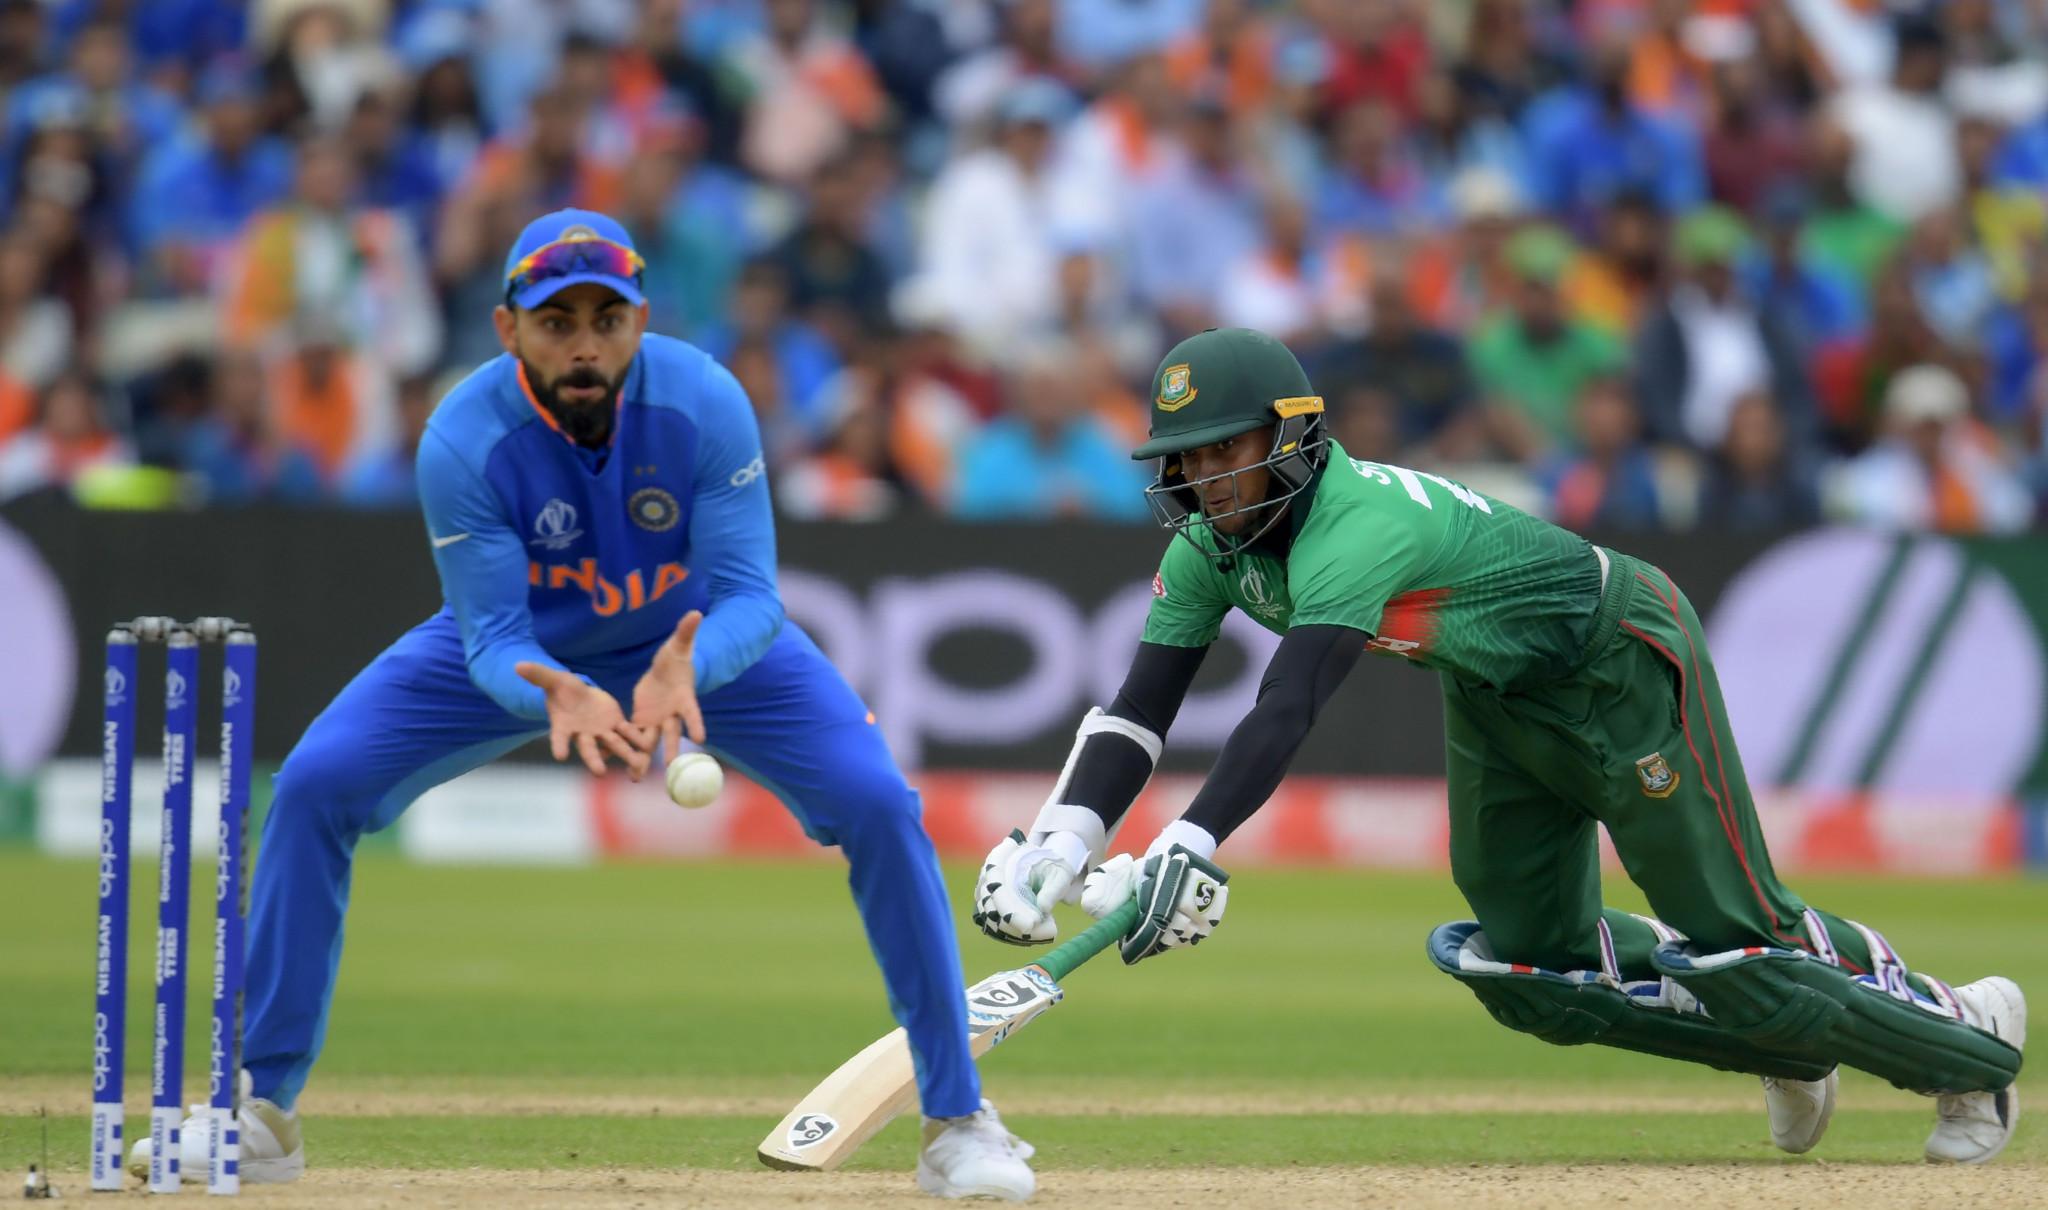 India beat Bangladesh to reach semi-finals at ICC Cricket World Cup